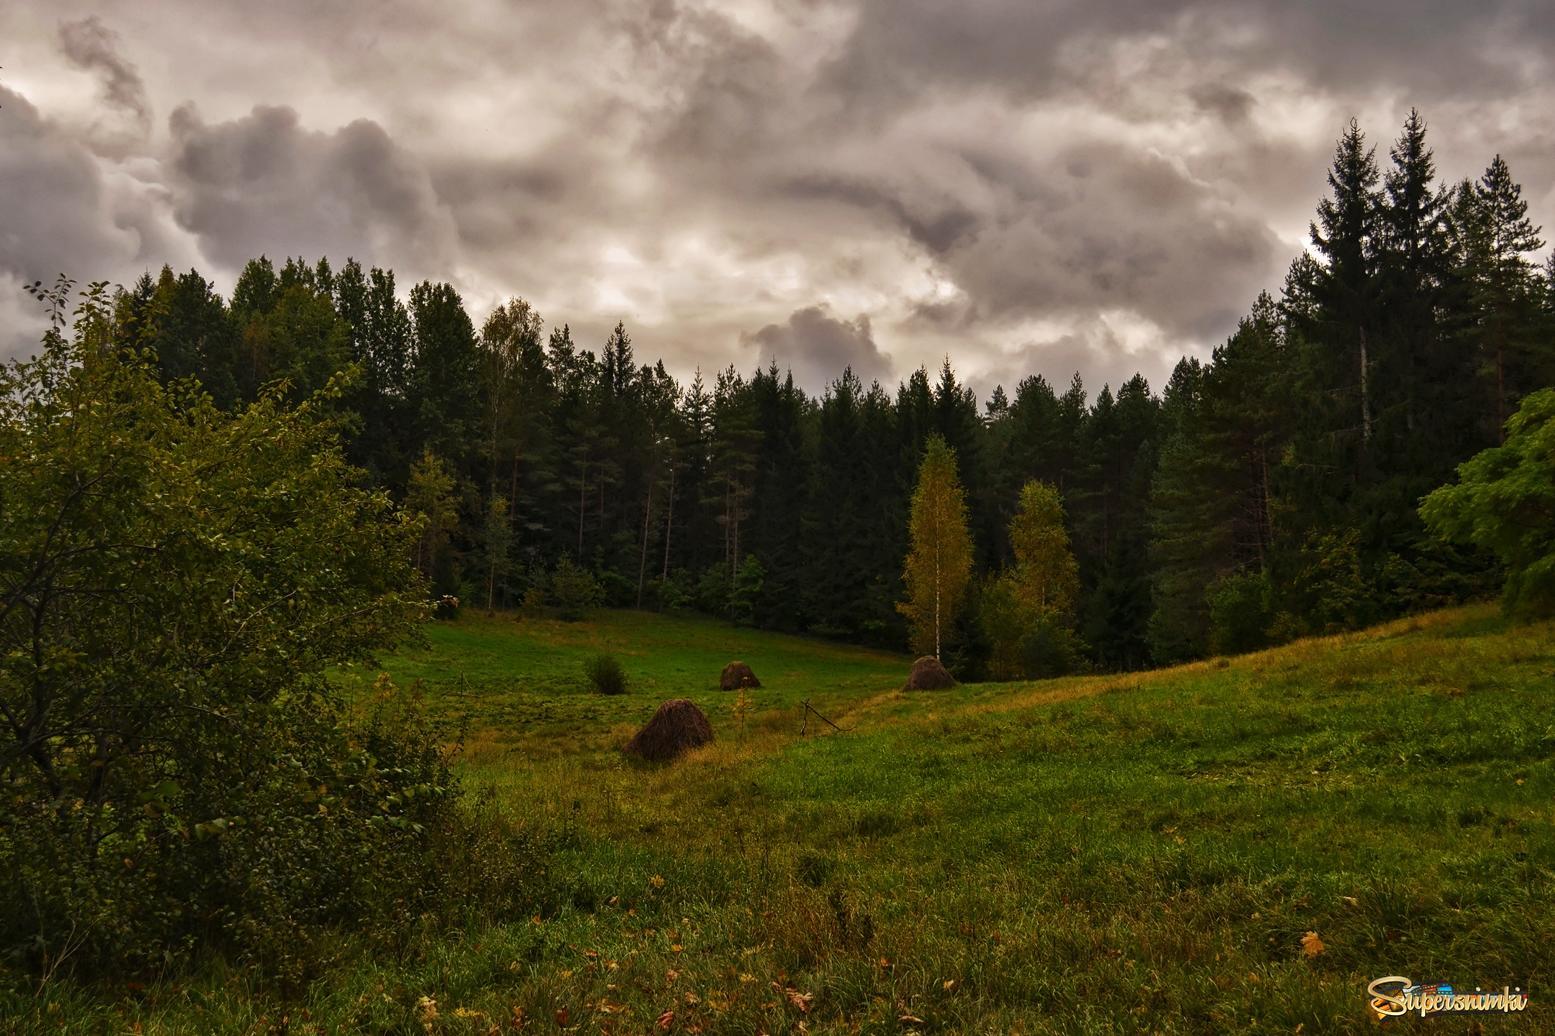 Картинки лесных опушек